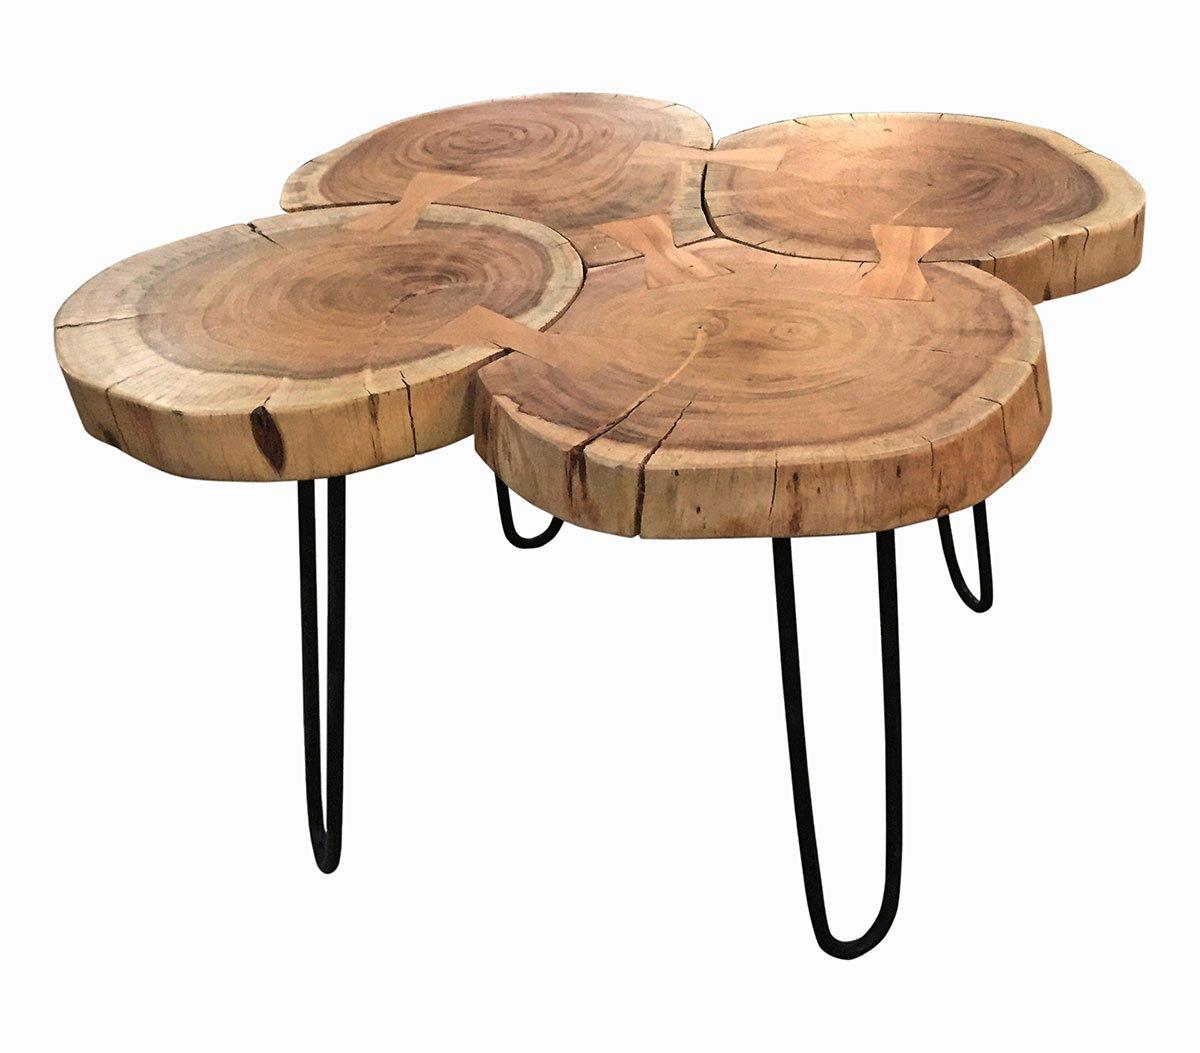 Konferenční stolek THIS & THAT – 50 × 50 × 45 cm